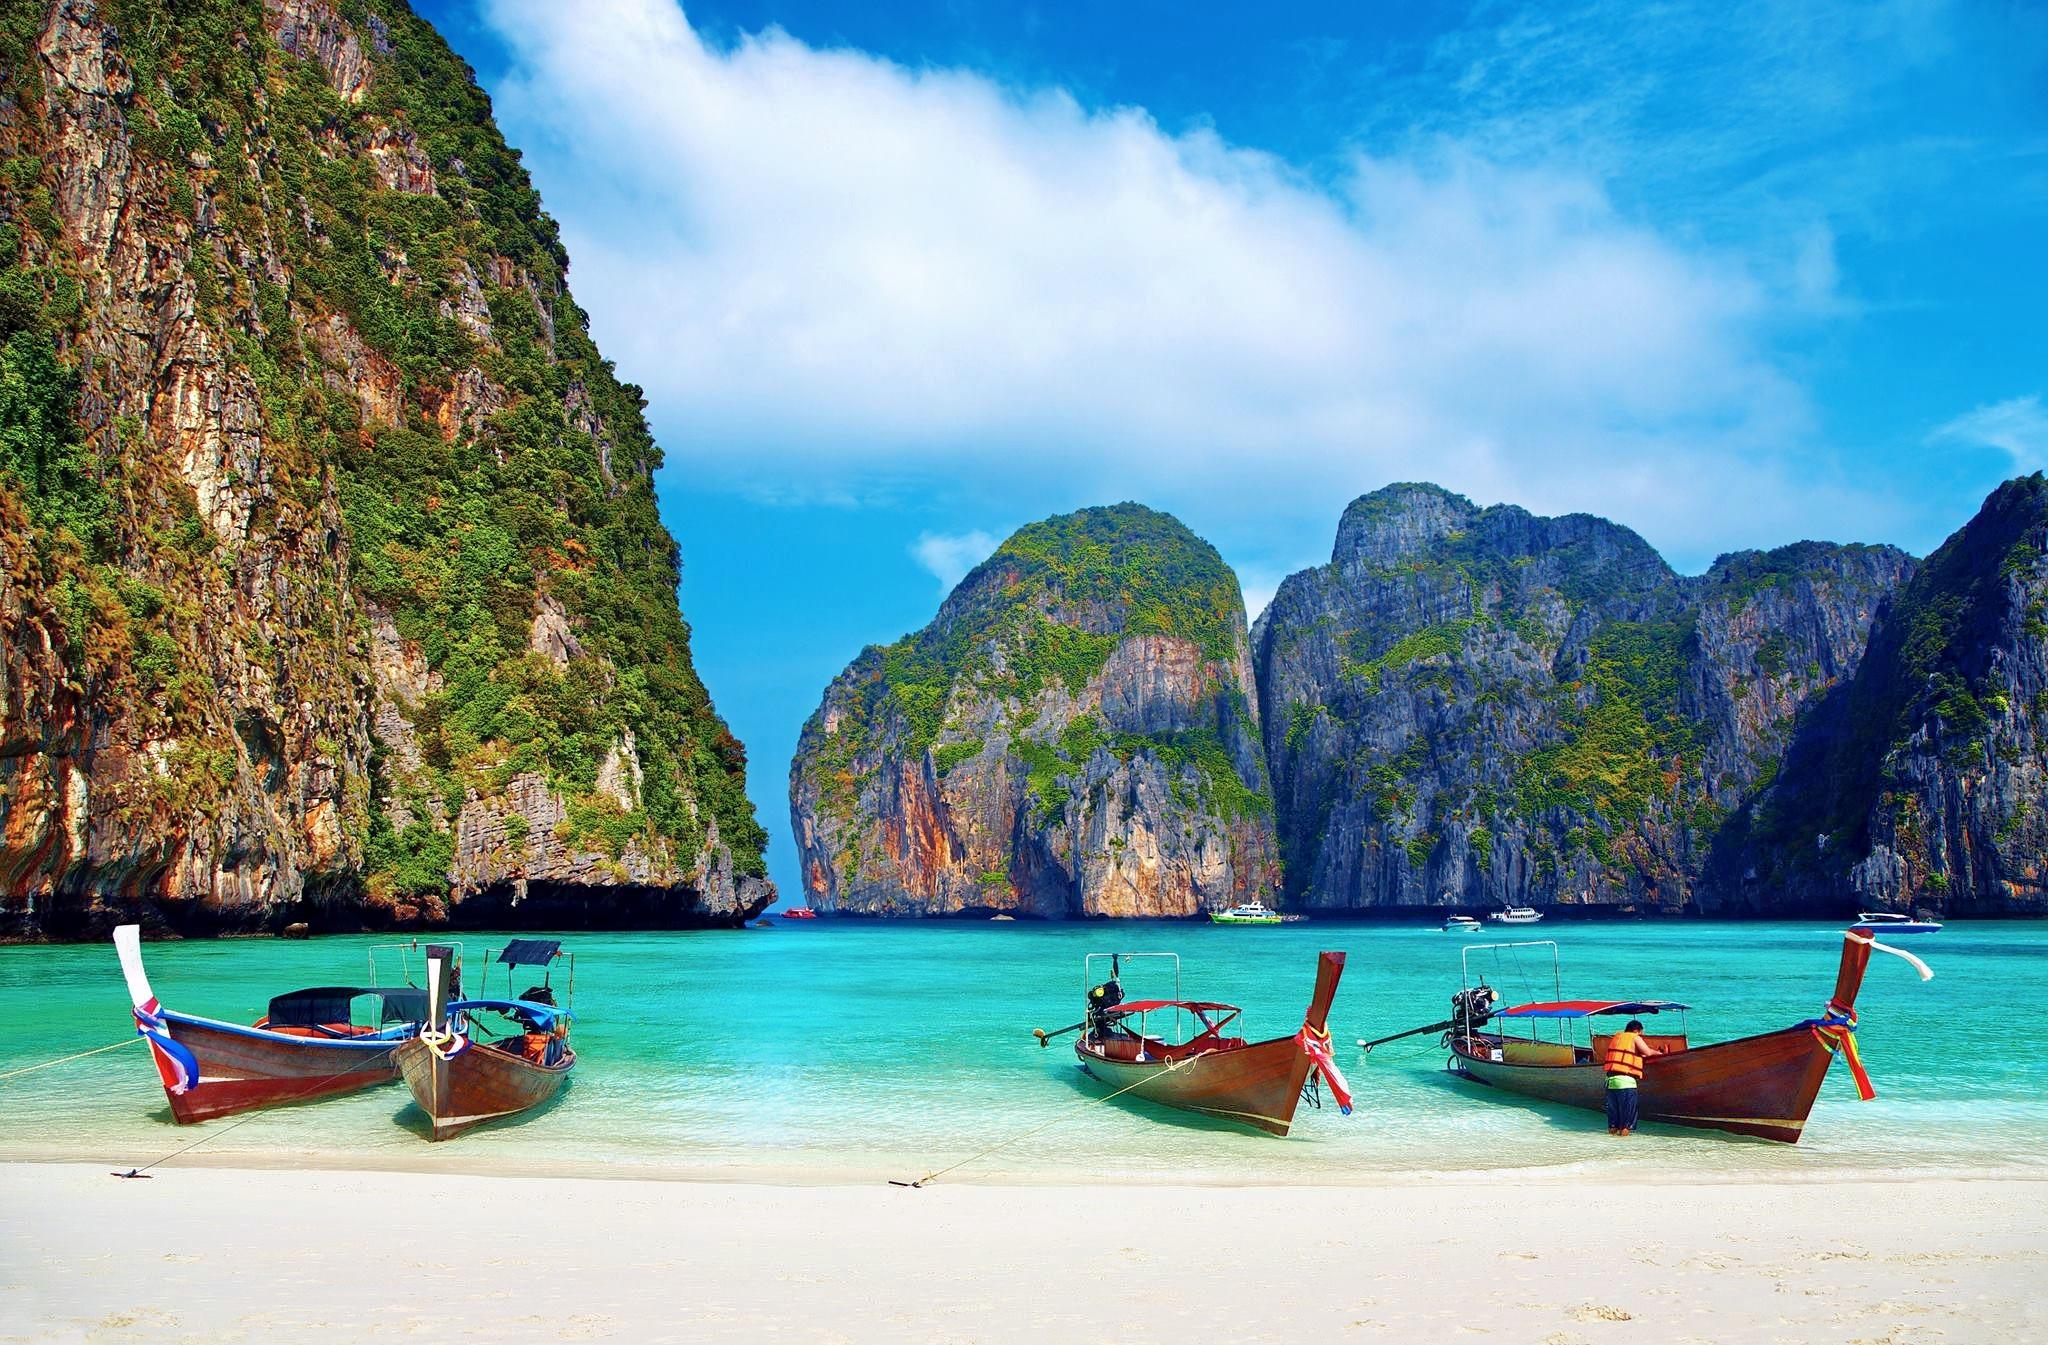 1476252148_phi-phi-island-boats.jpg